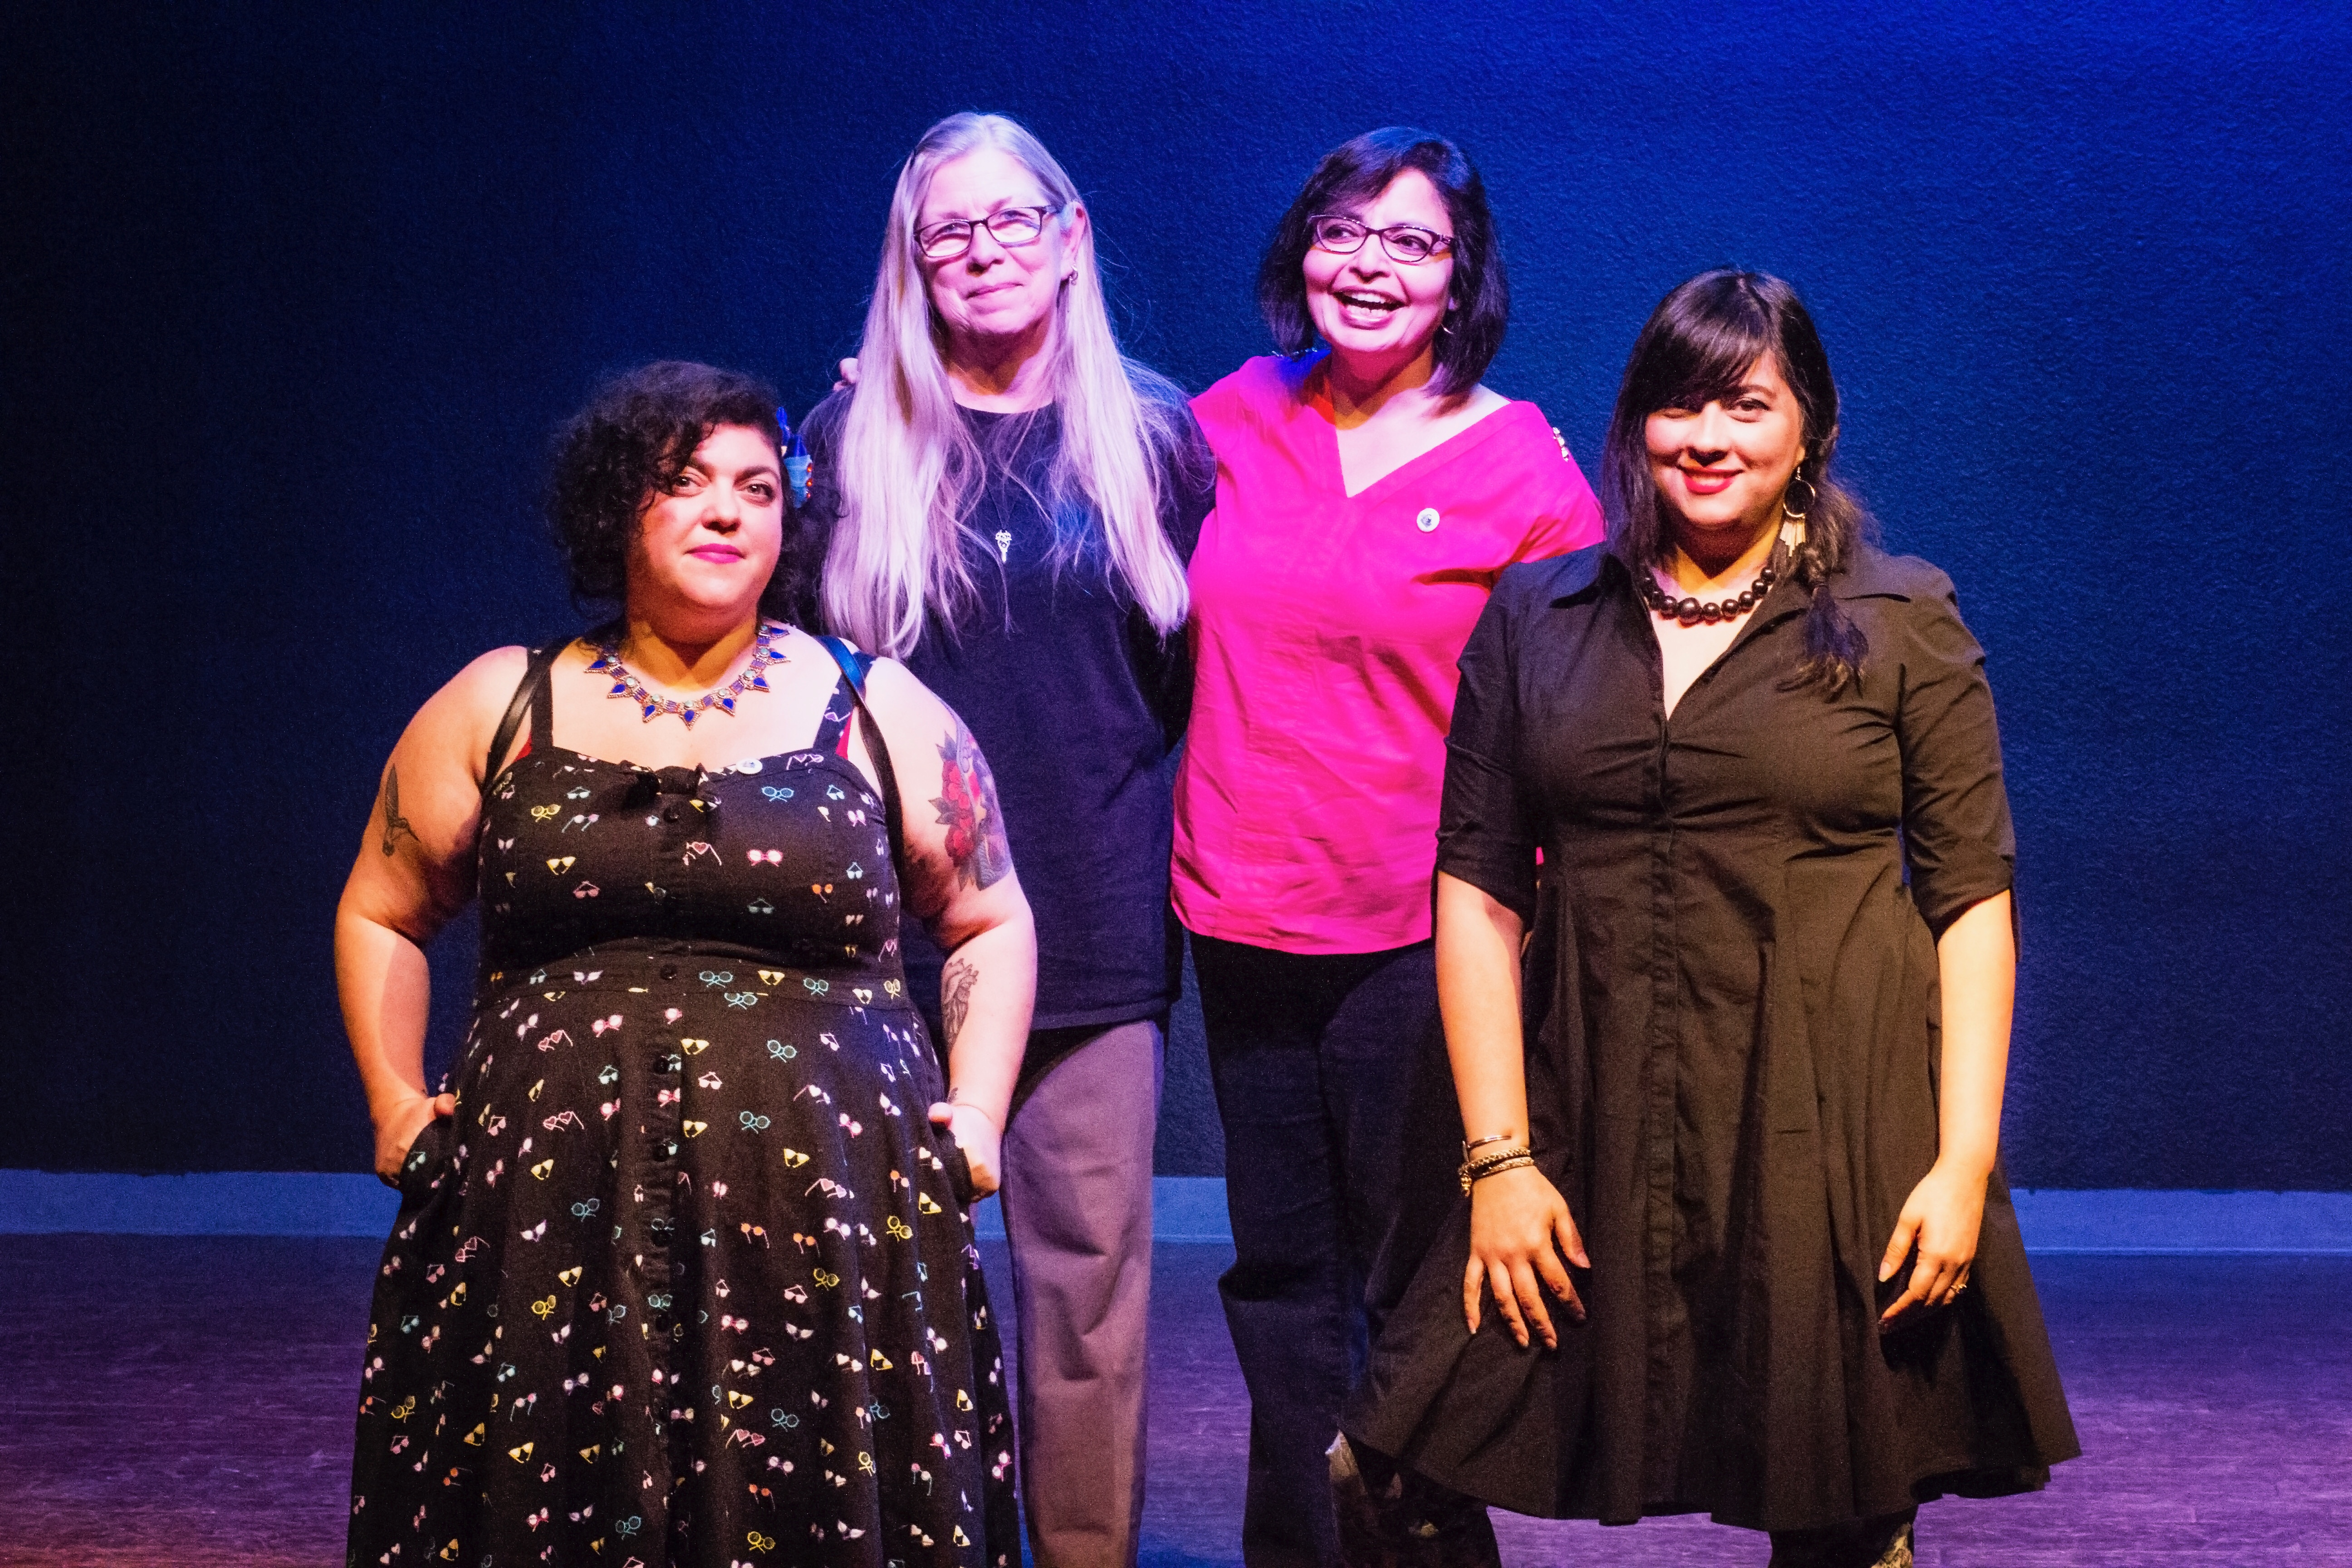 Group shot of all four readers: Randa Jarrar, Connie Hales, Samina Najmi, and Marisol Baca.